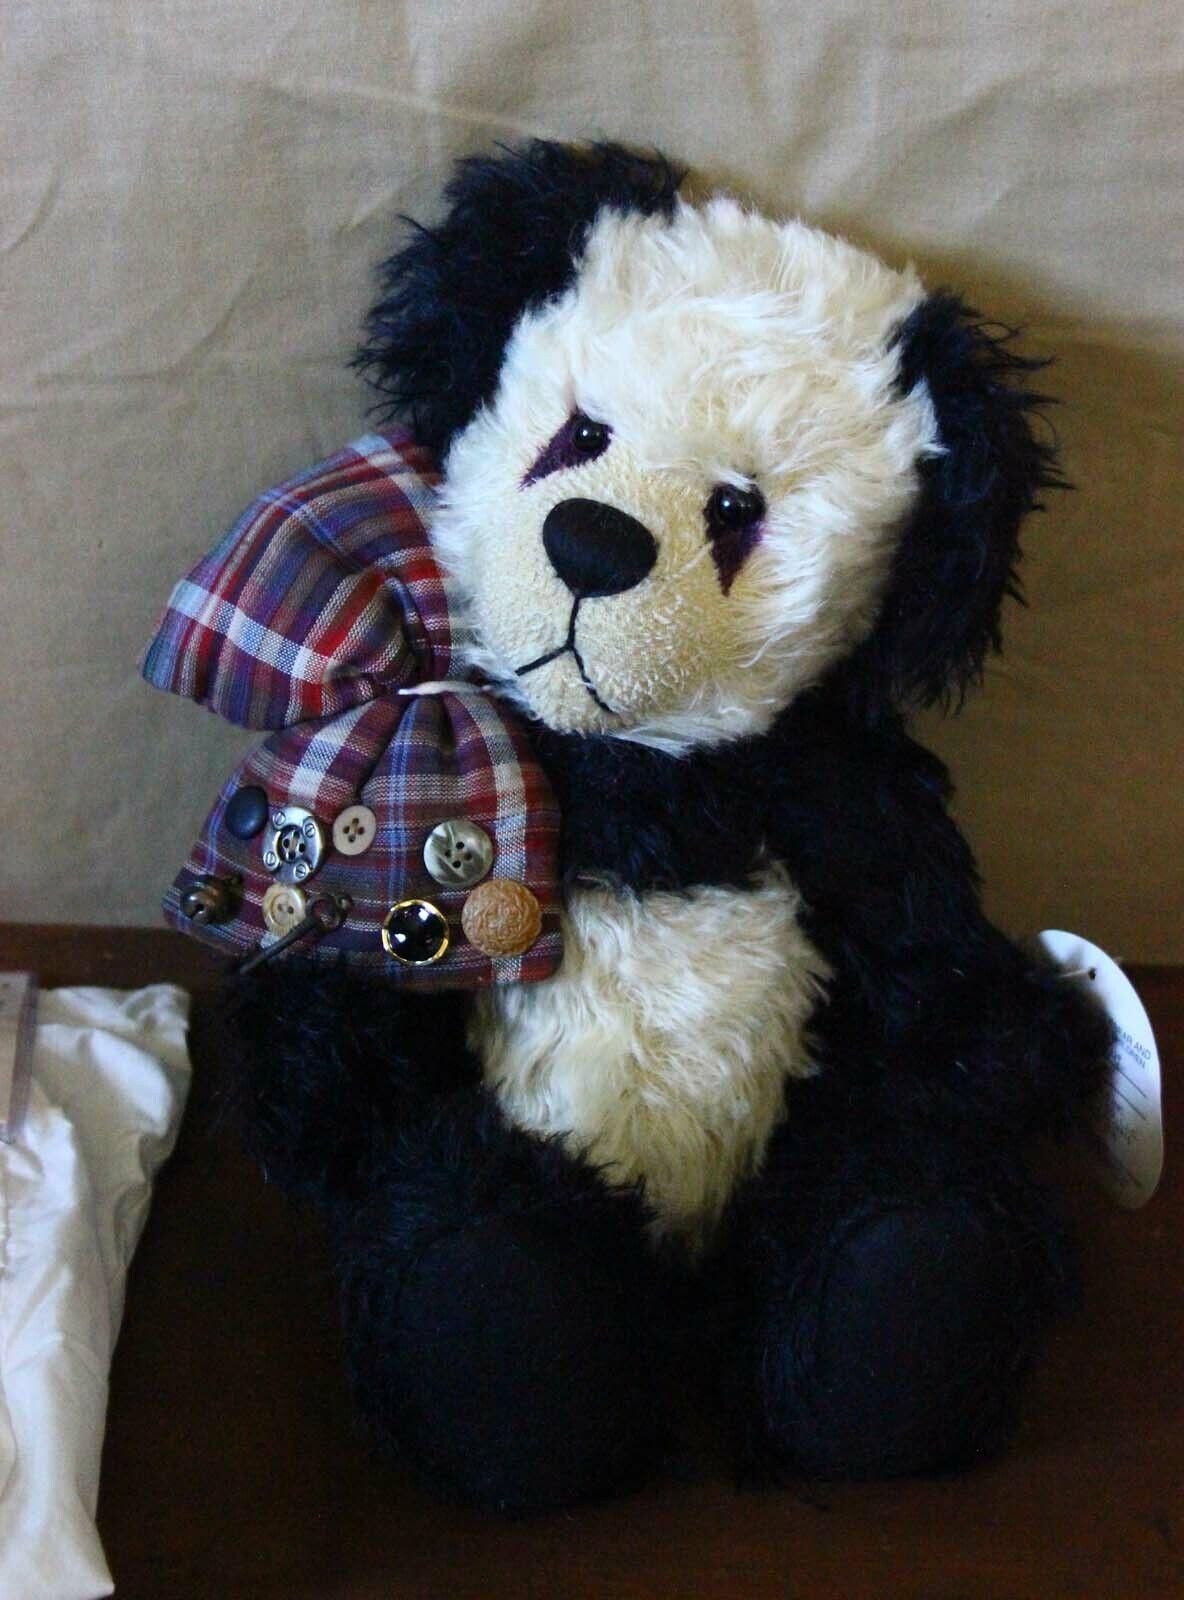 Jackie Melerski Bear Essentials Artist Mohair Teddy Bear Panda 13